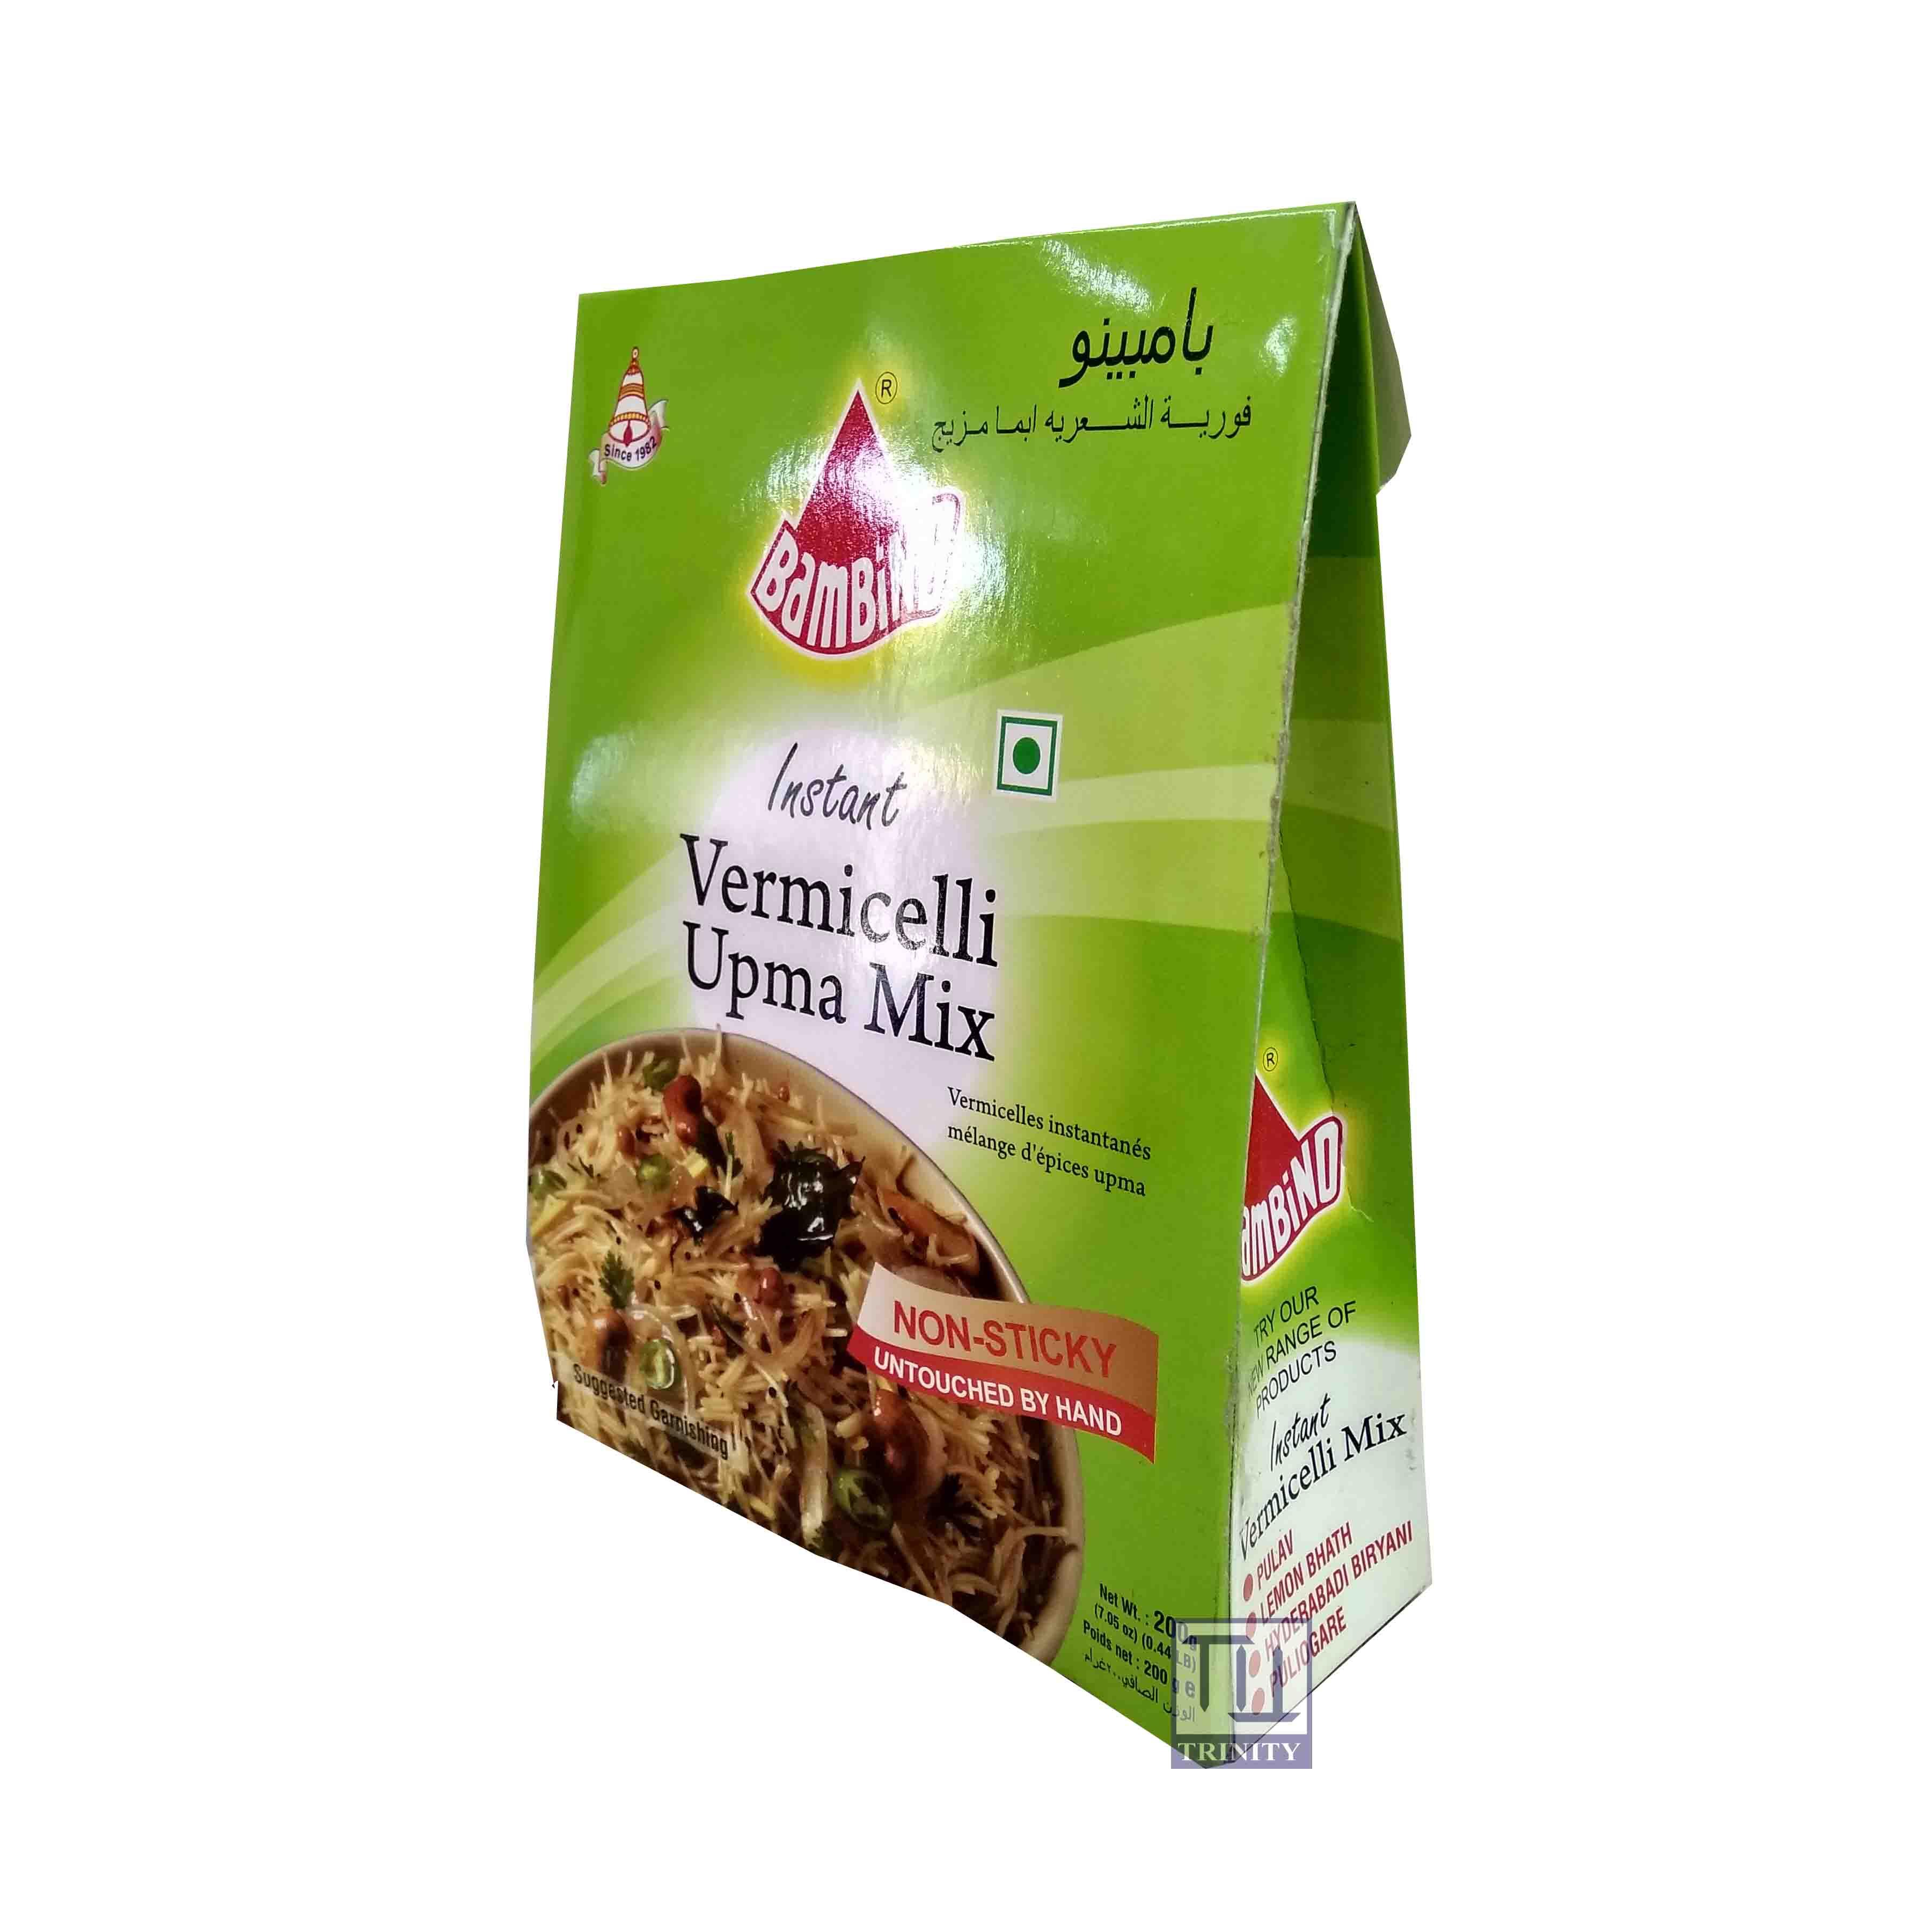 Bambino Instant Vermicelli Upma Mix   印度巴比諾 麵線即時調理粉